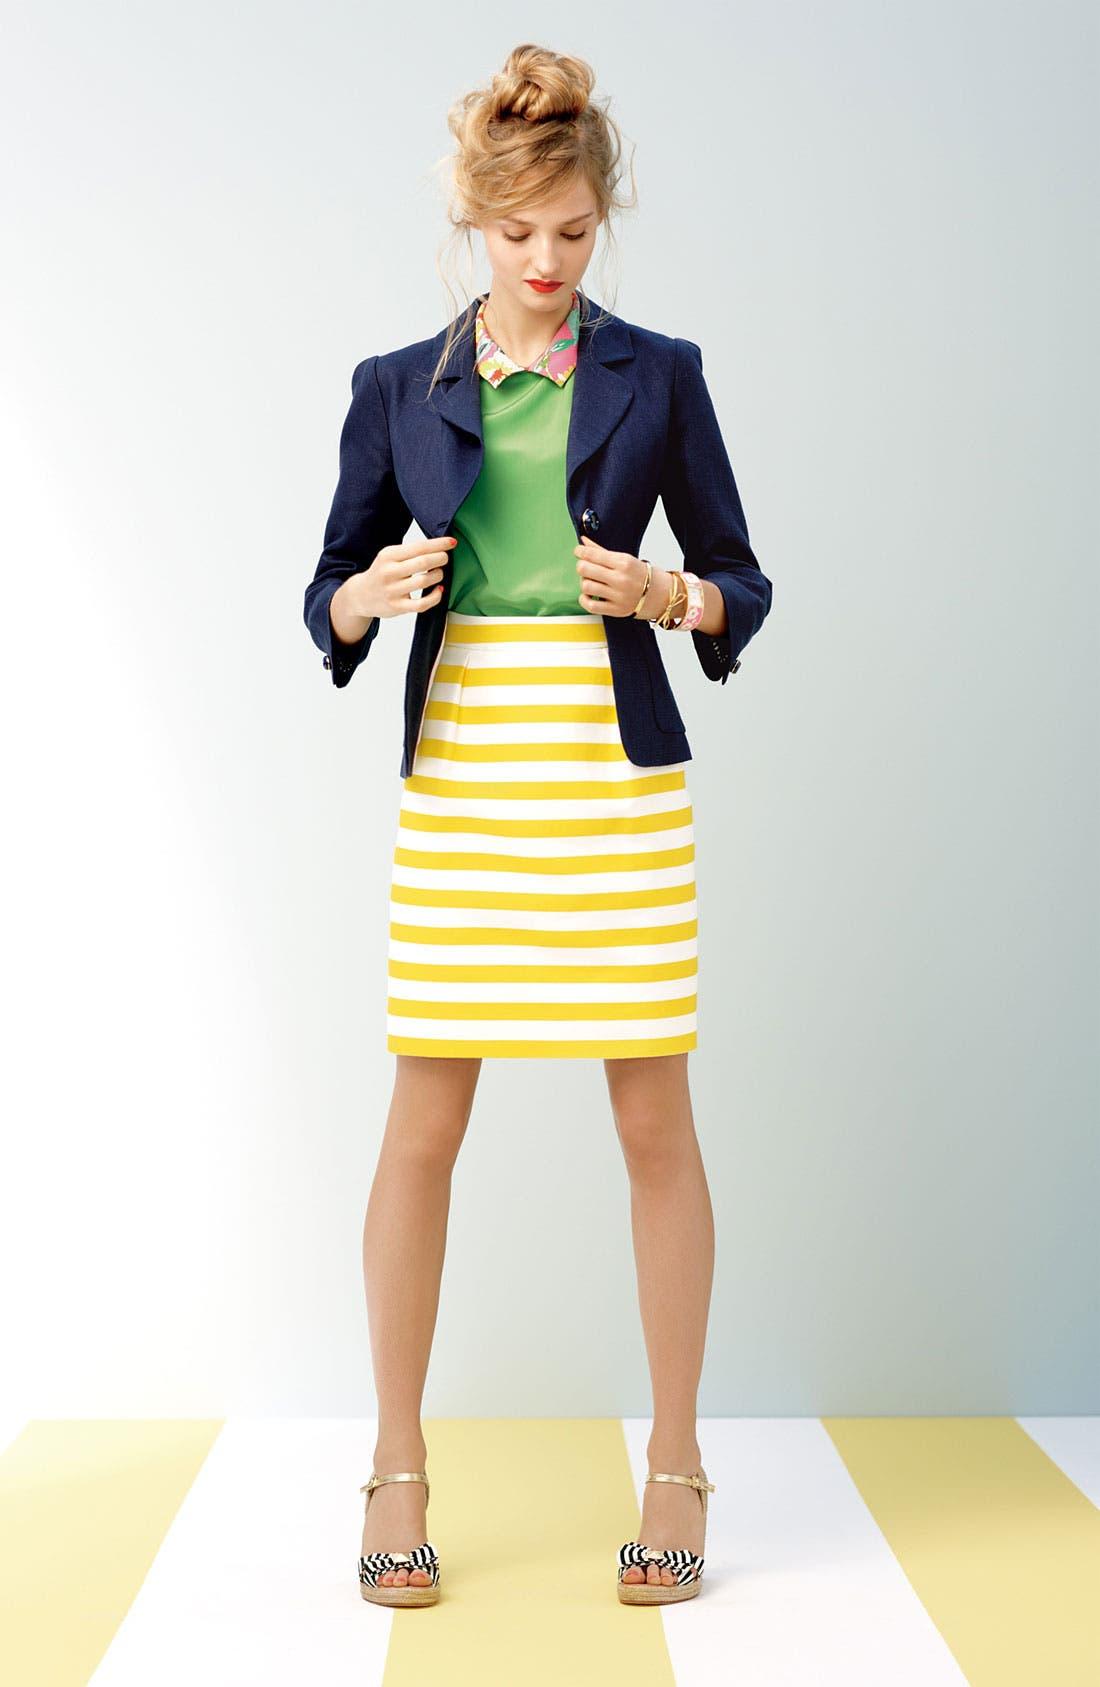 Main Image - kate spade new york jacket, top & skirt